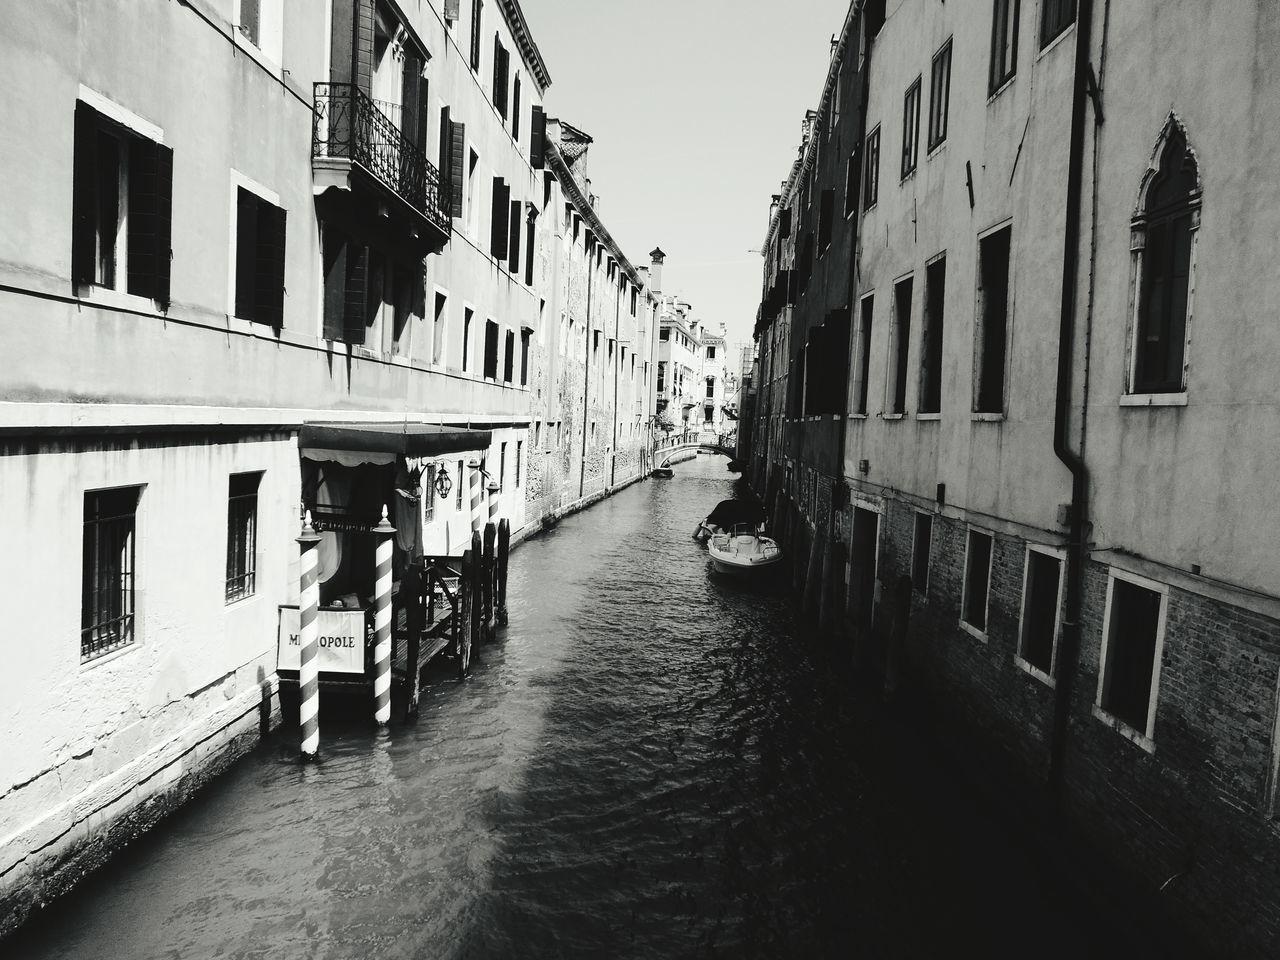 Narrow Canal Along Buildings